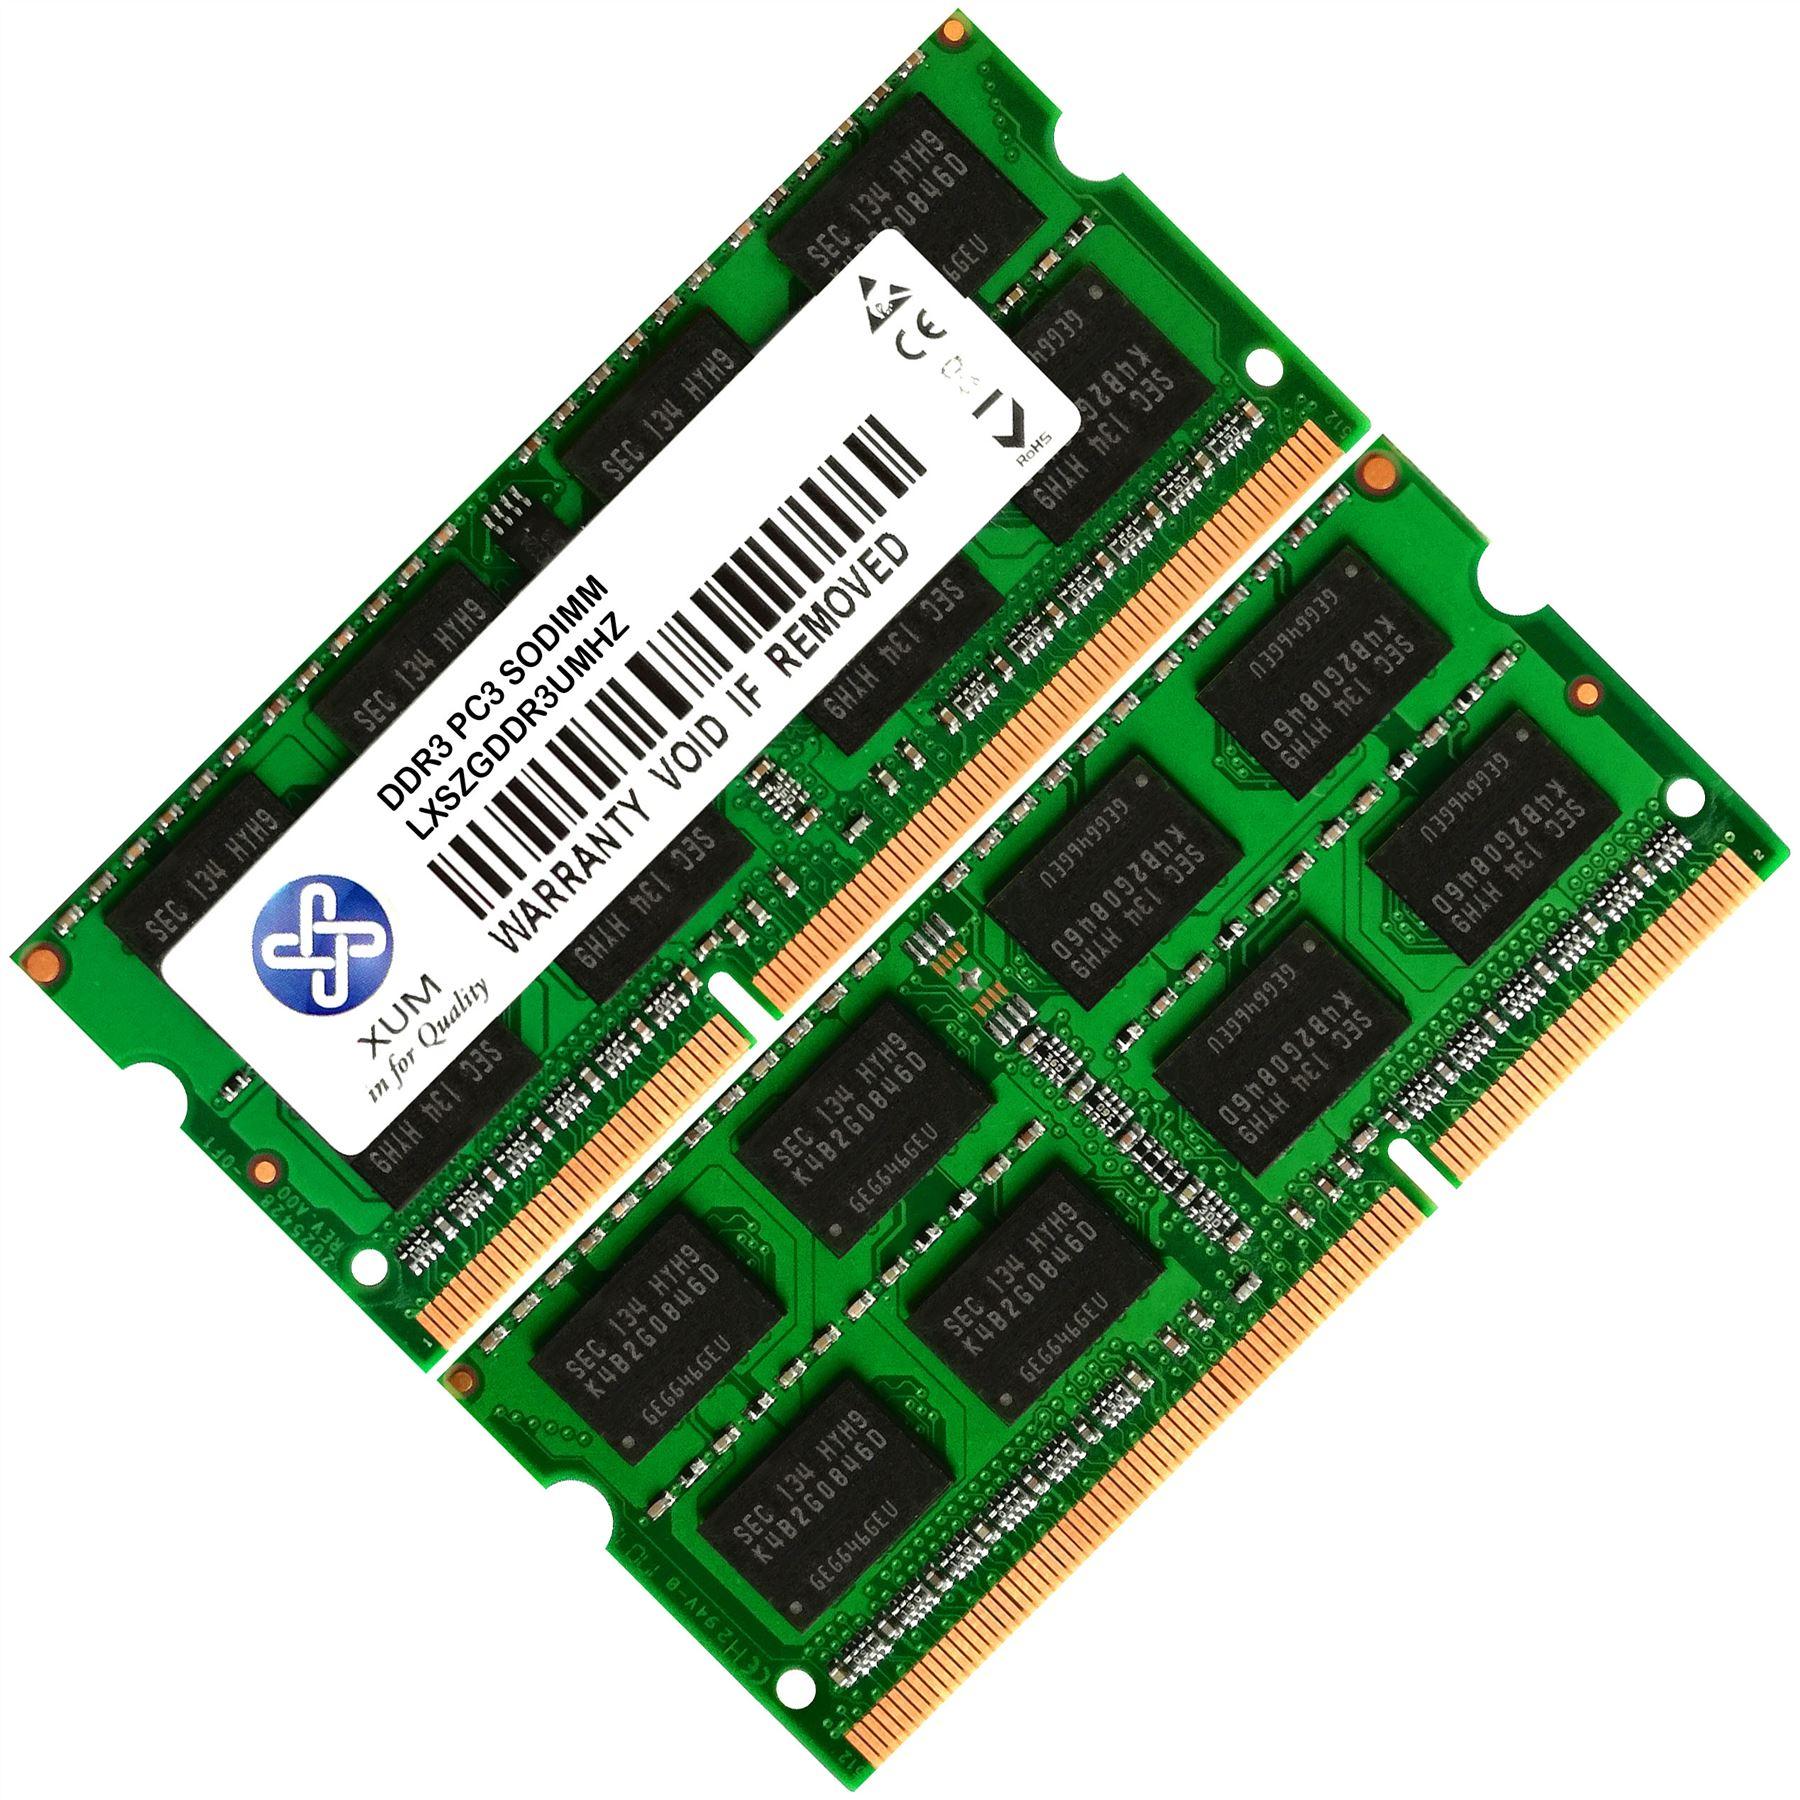 Memoria-Ram-4-Hp-Envy-Notebook-Laptop-6-1019tx-Ultrabook-6-1020eb-Nuevo-2x-Lot